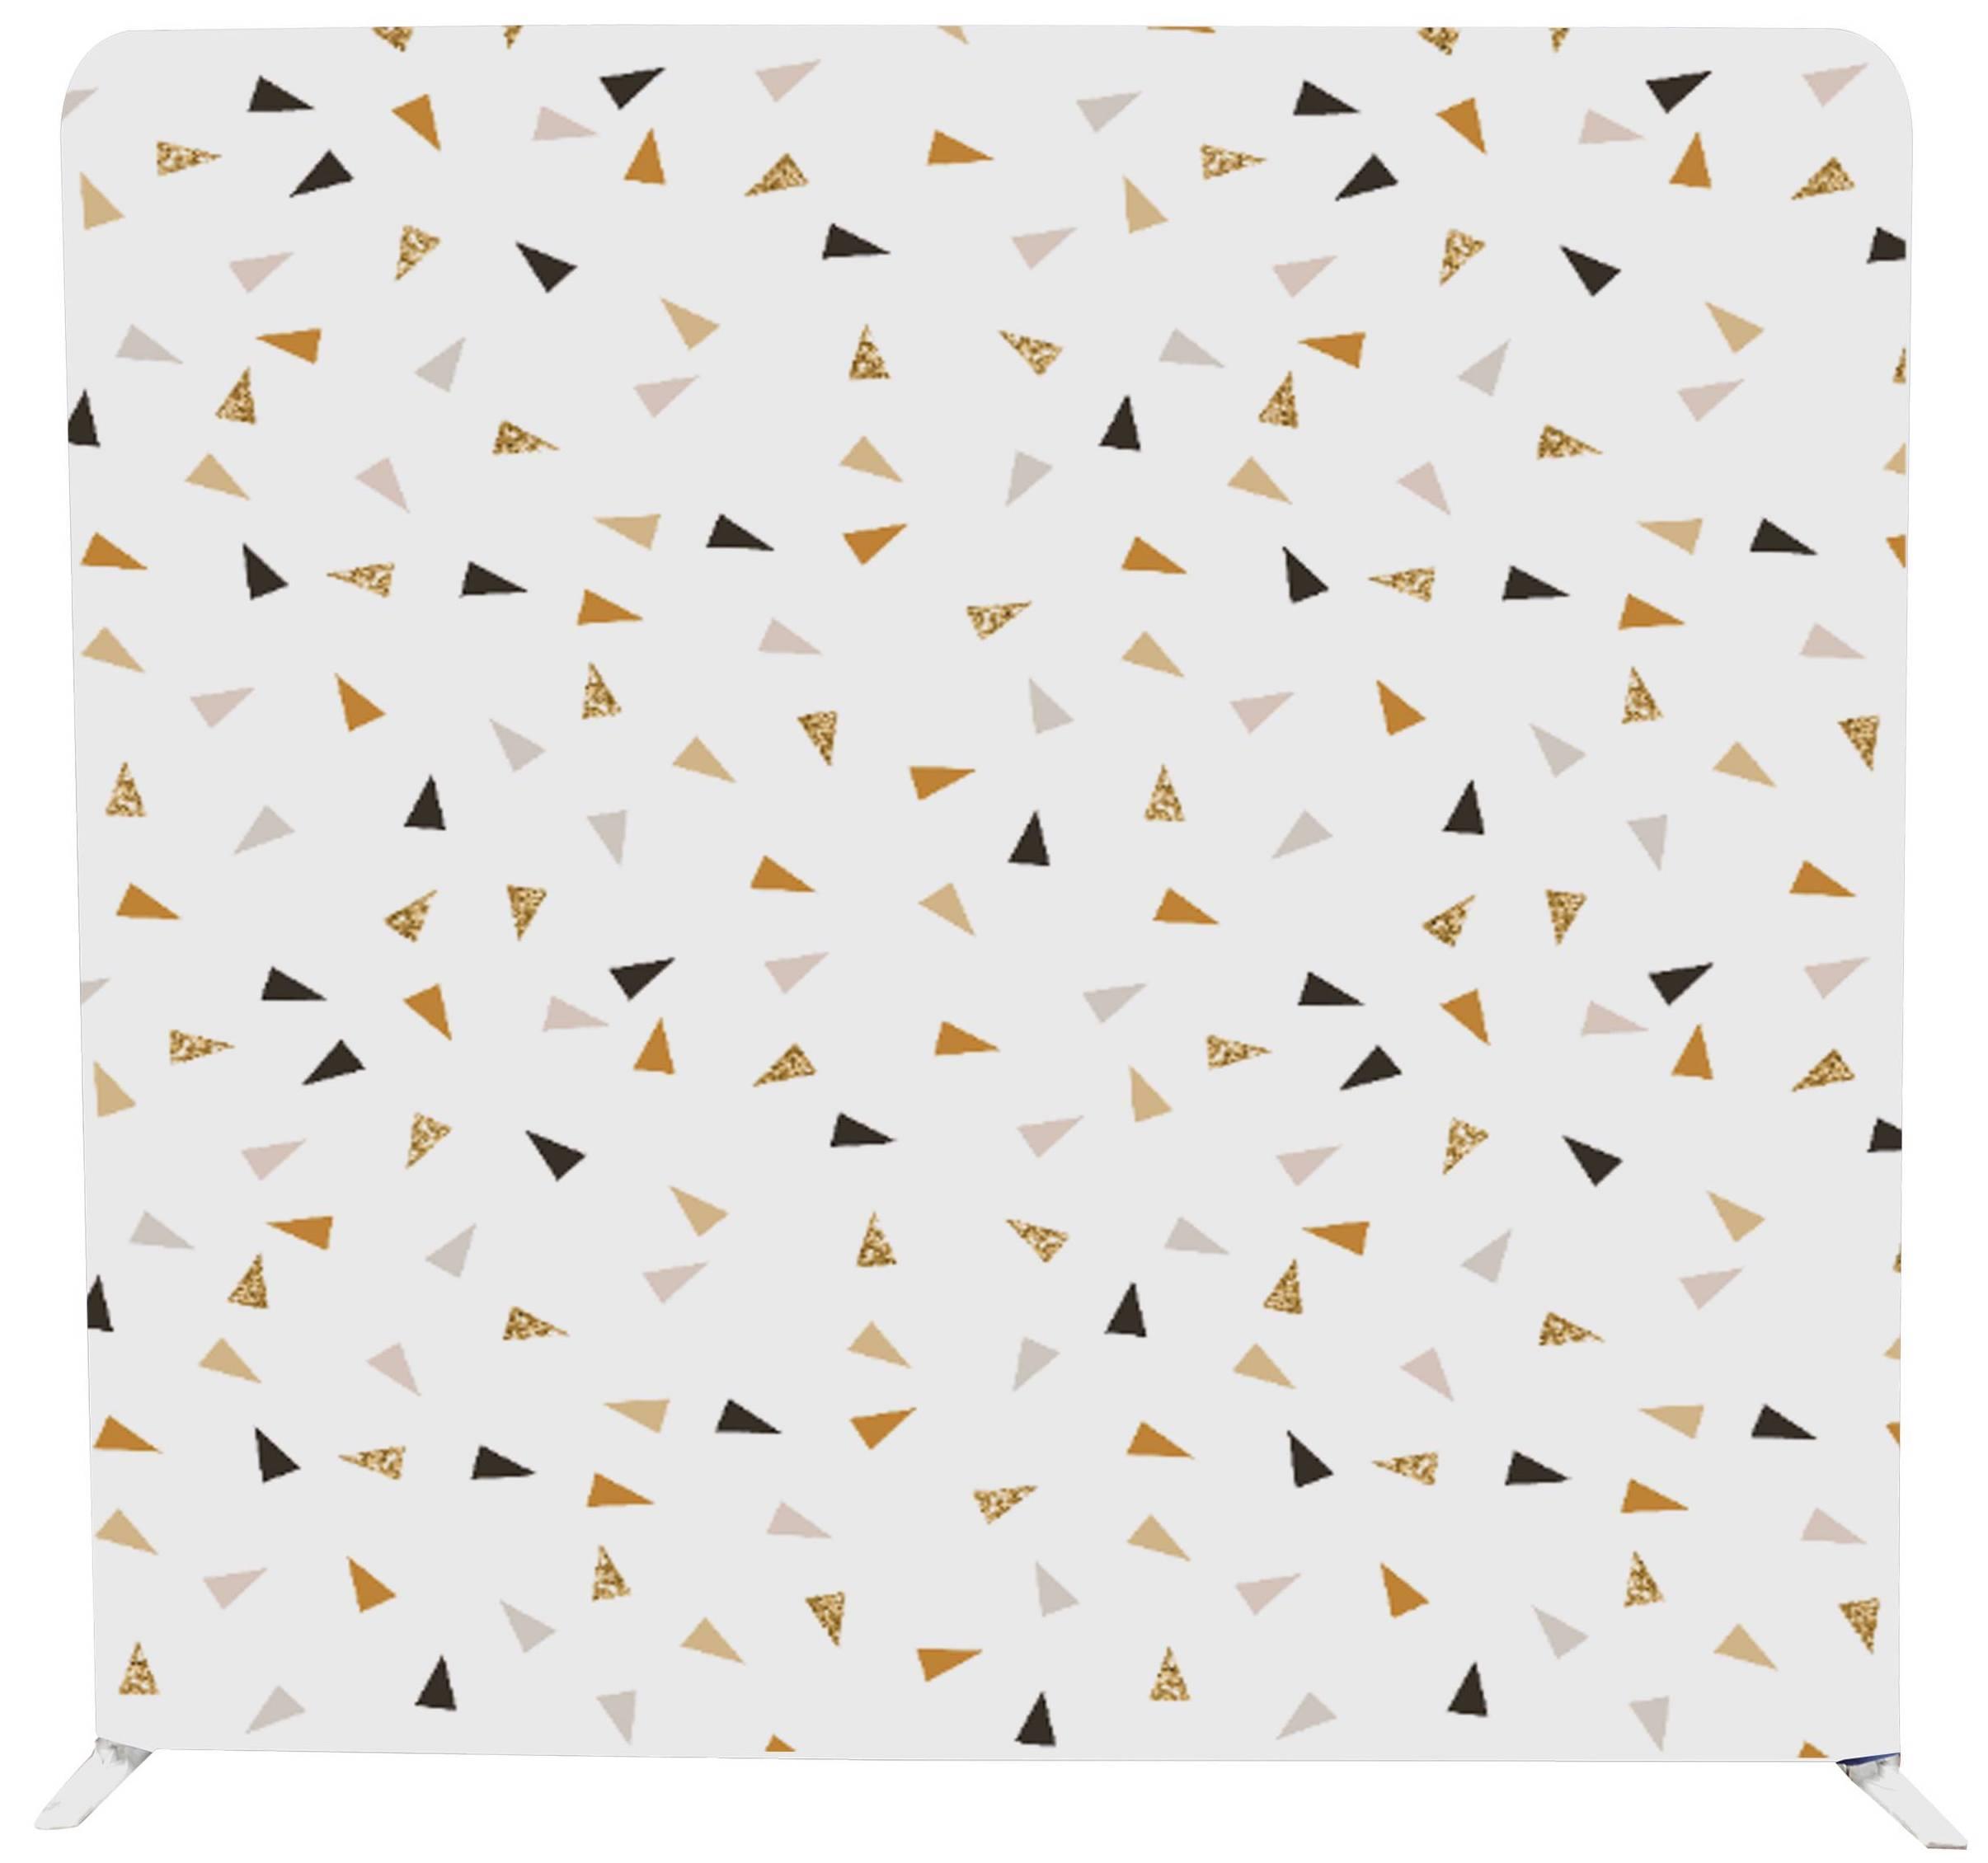 8x8ft Pattern Backdrop